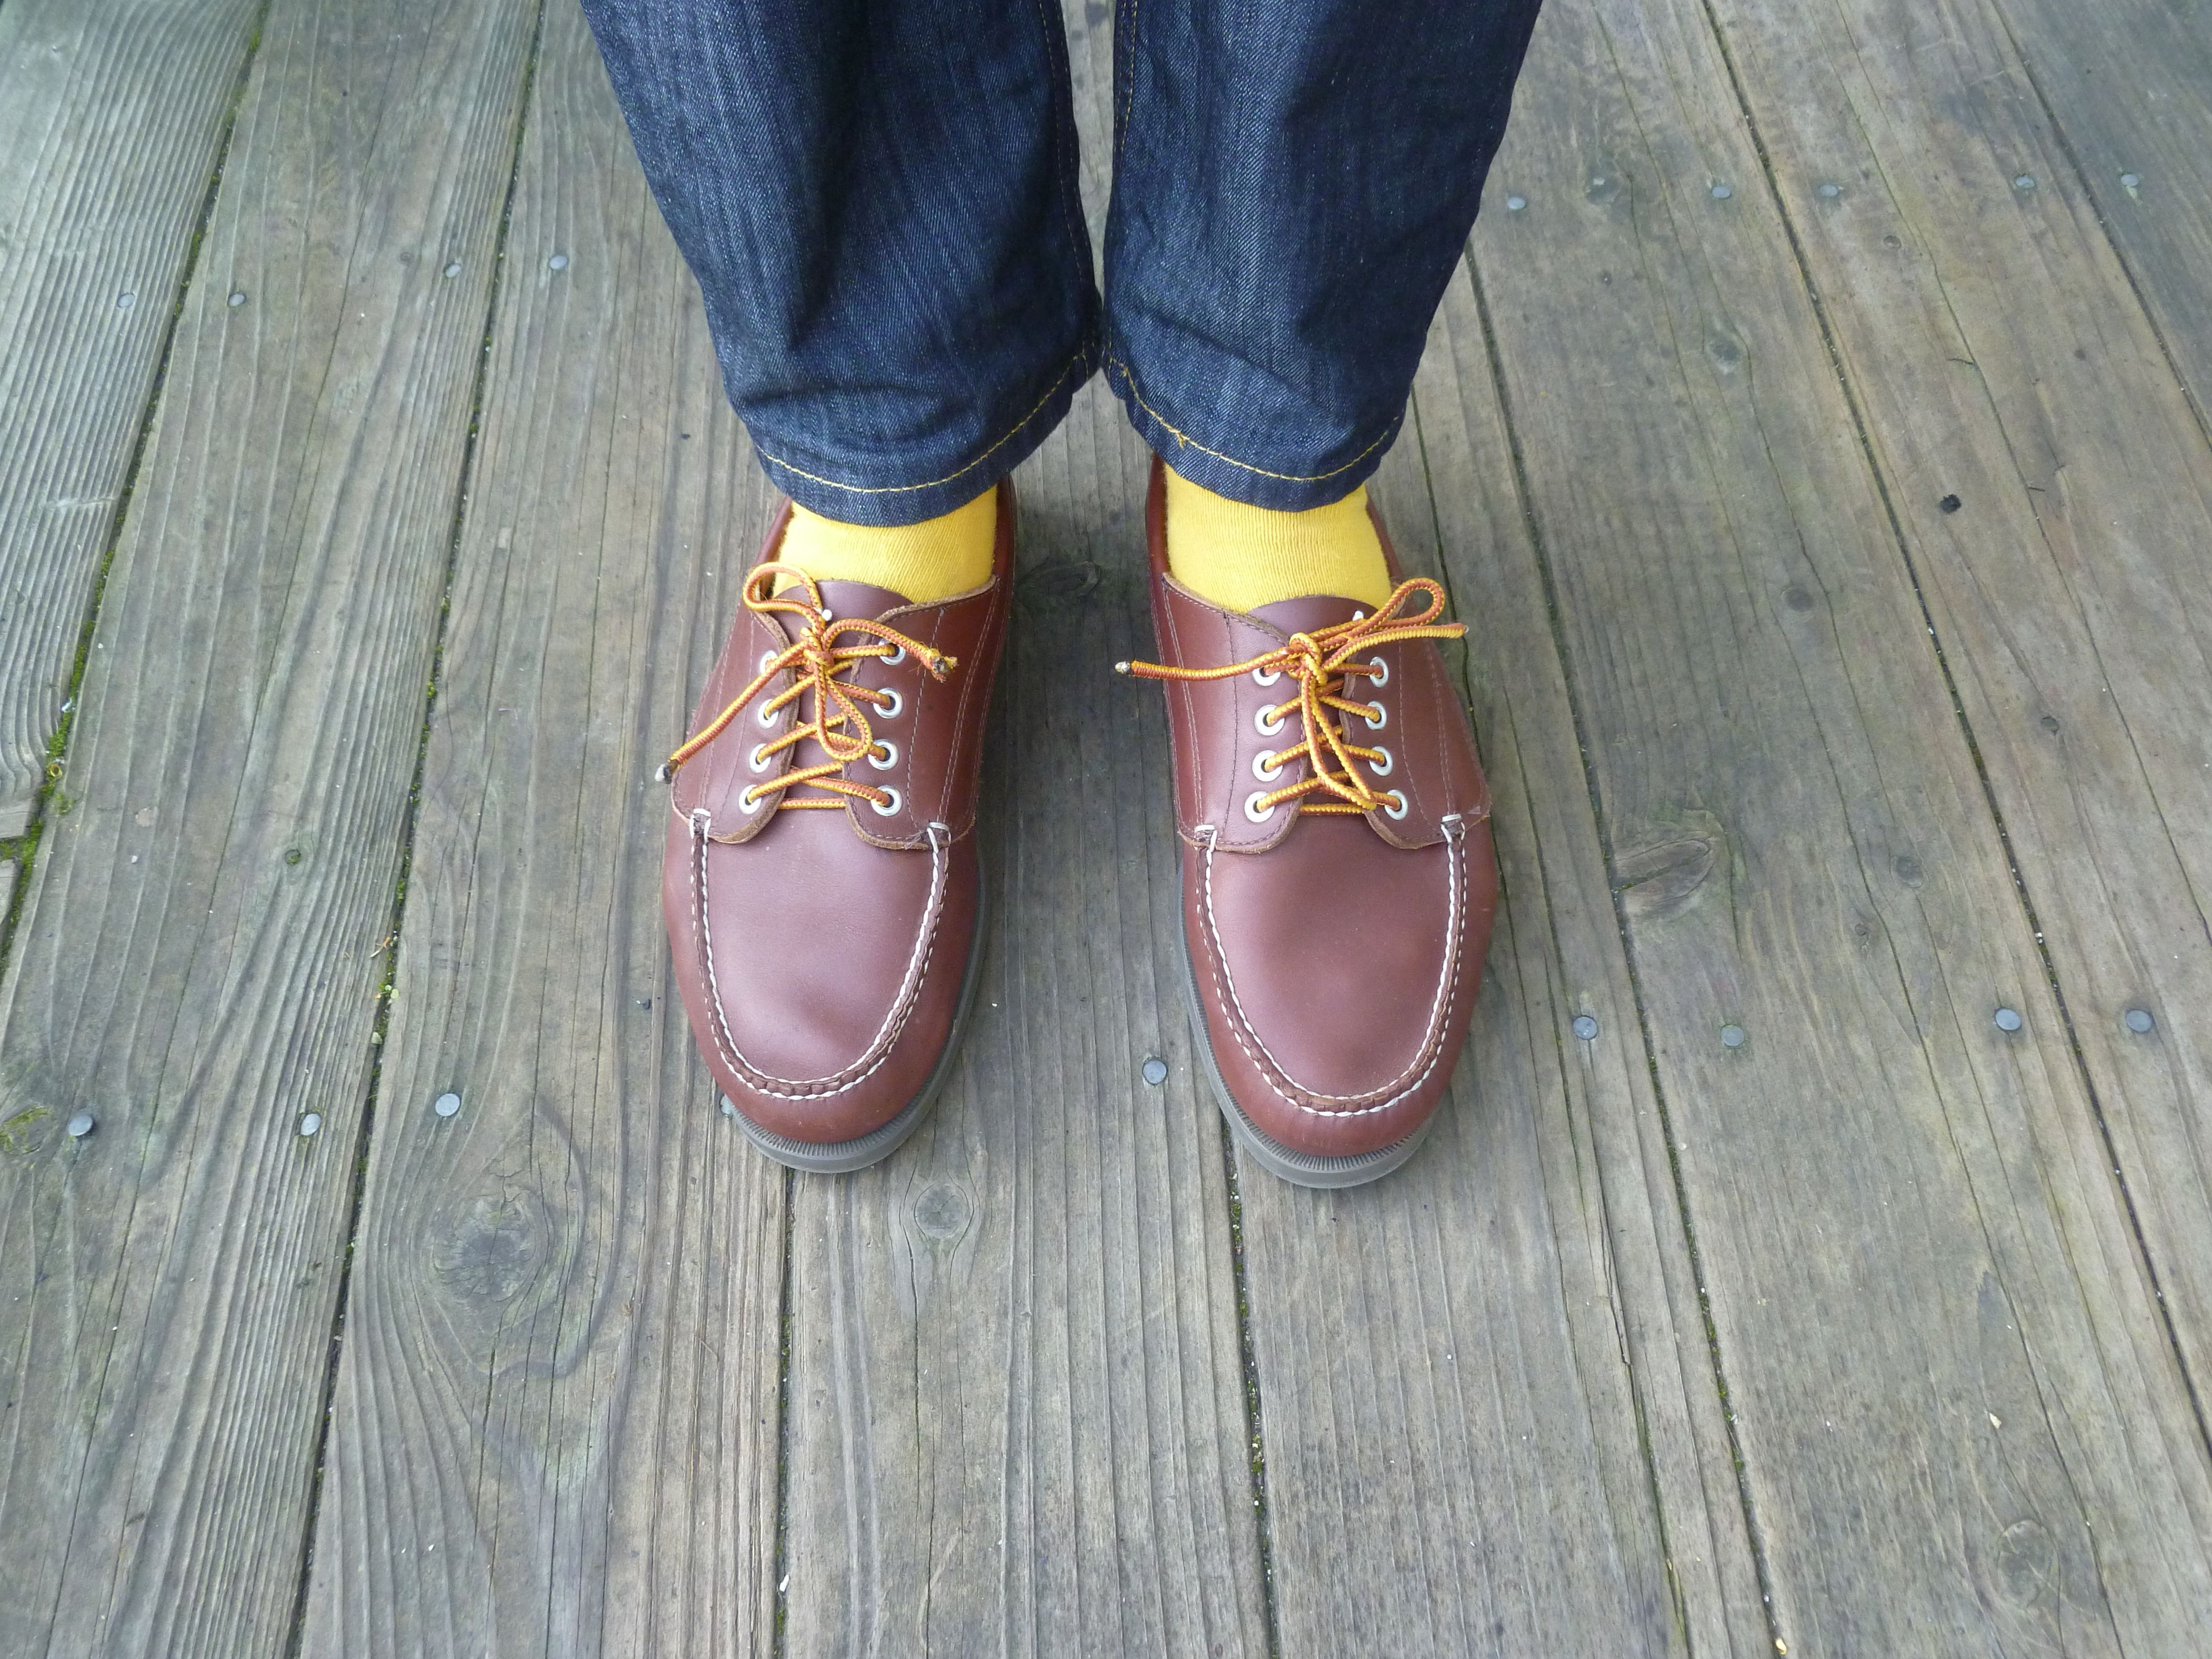 Ll Bean Blucher Mocs Fashion Shoes Boat Shoes Sperrys